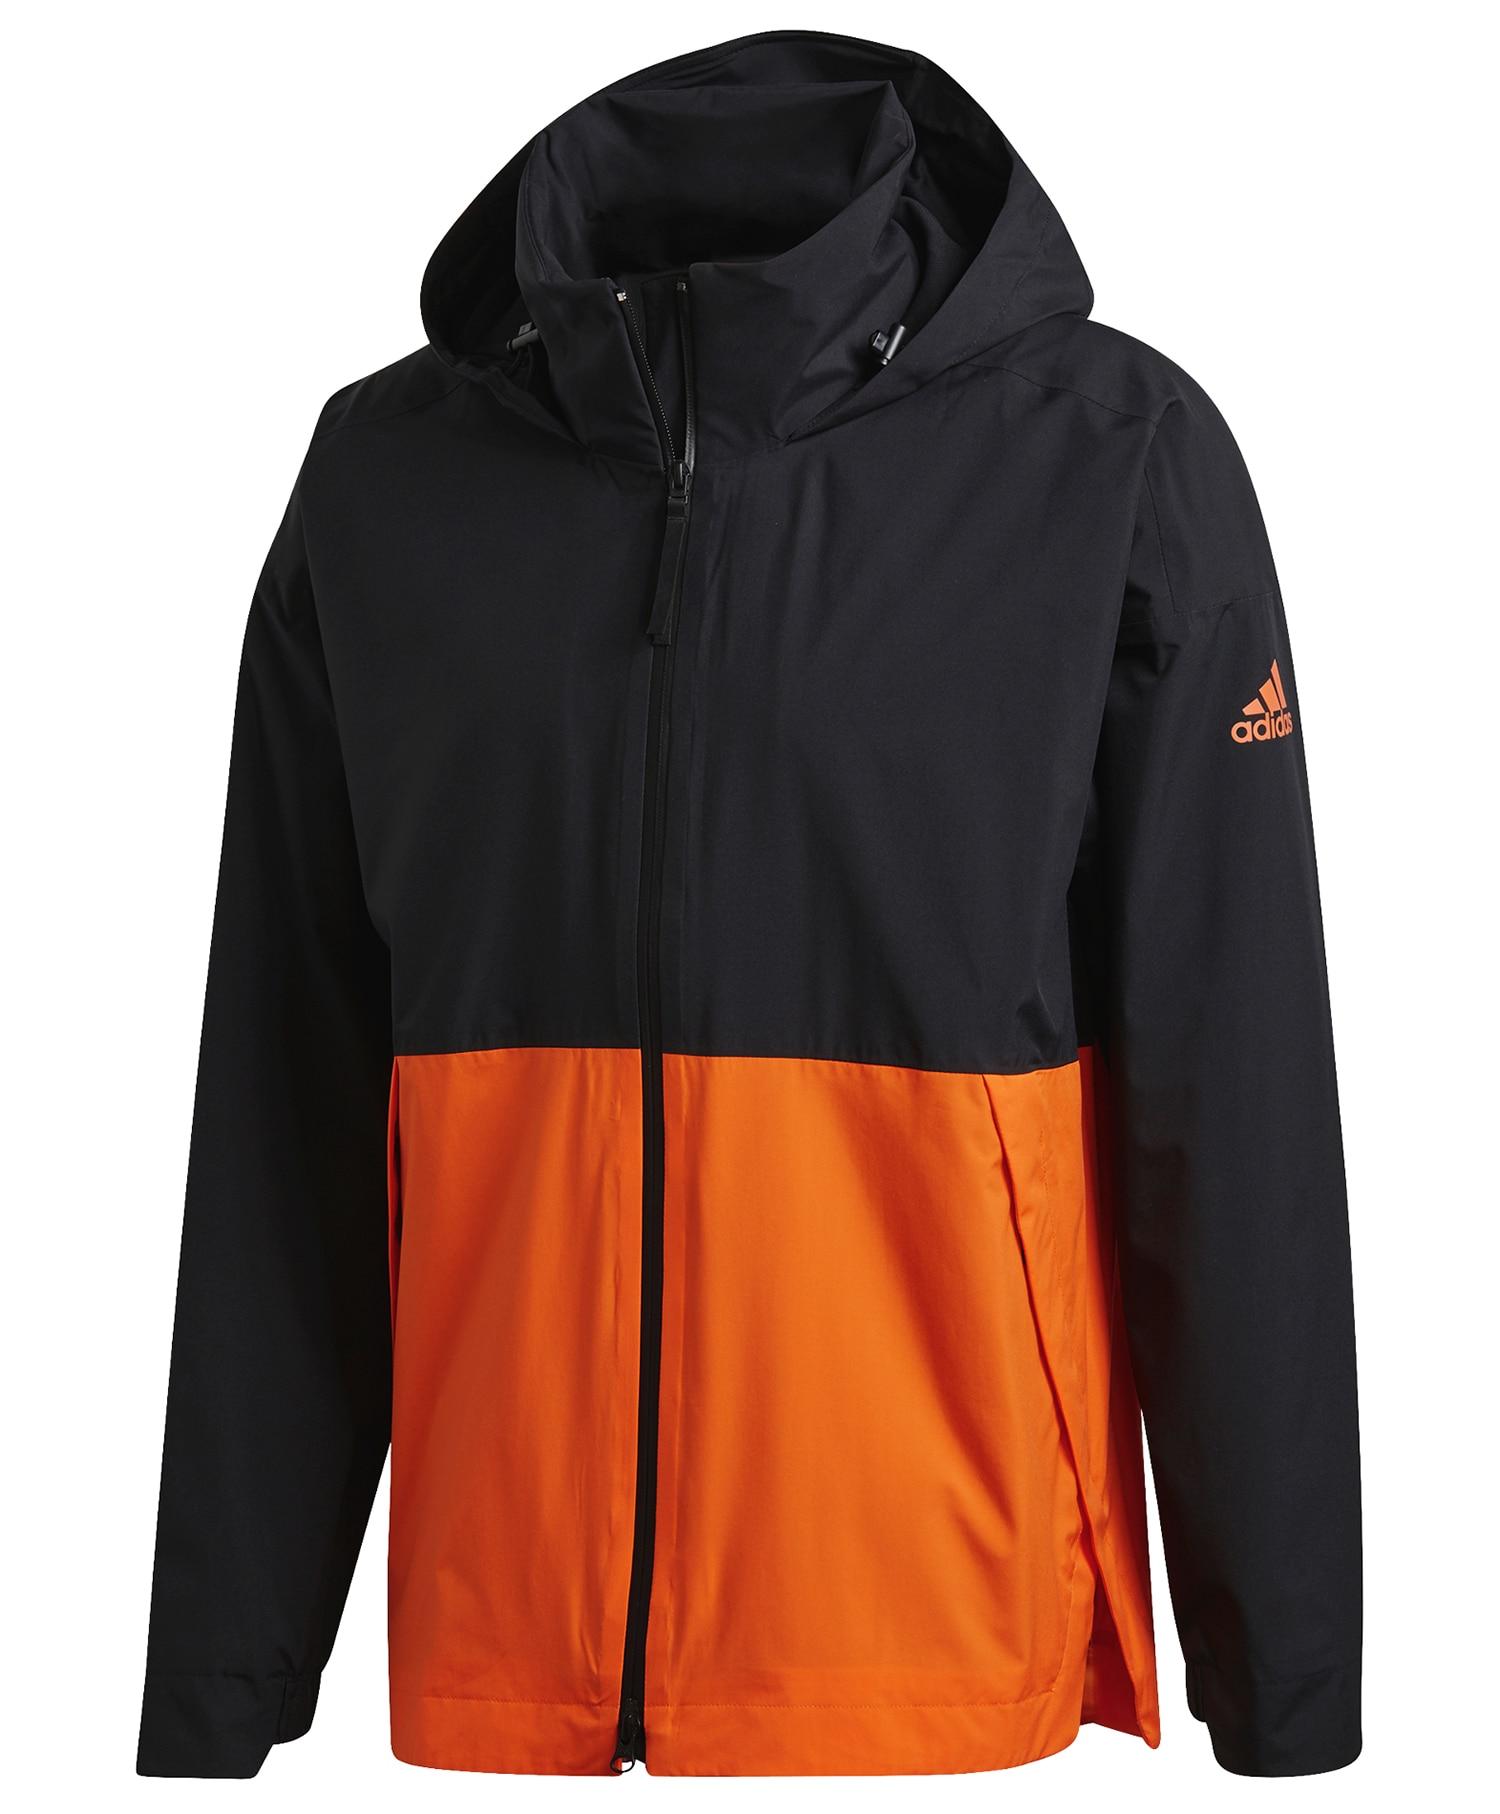 Adidas urban jakke